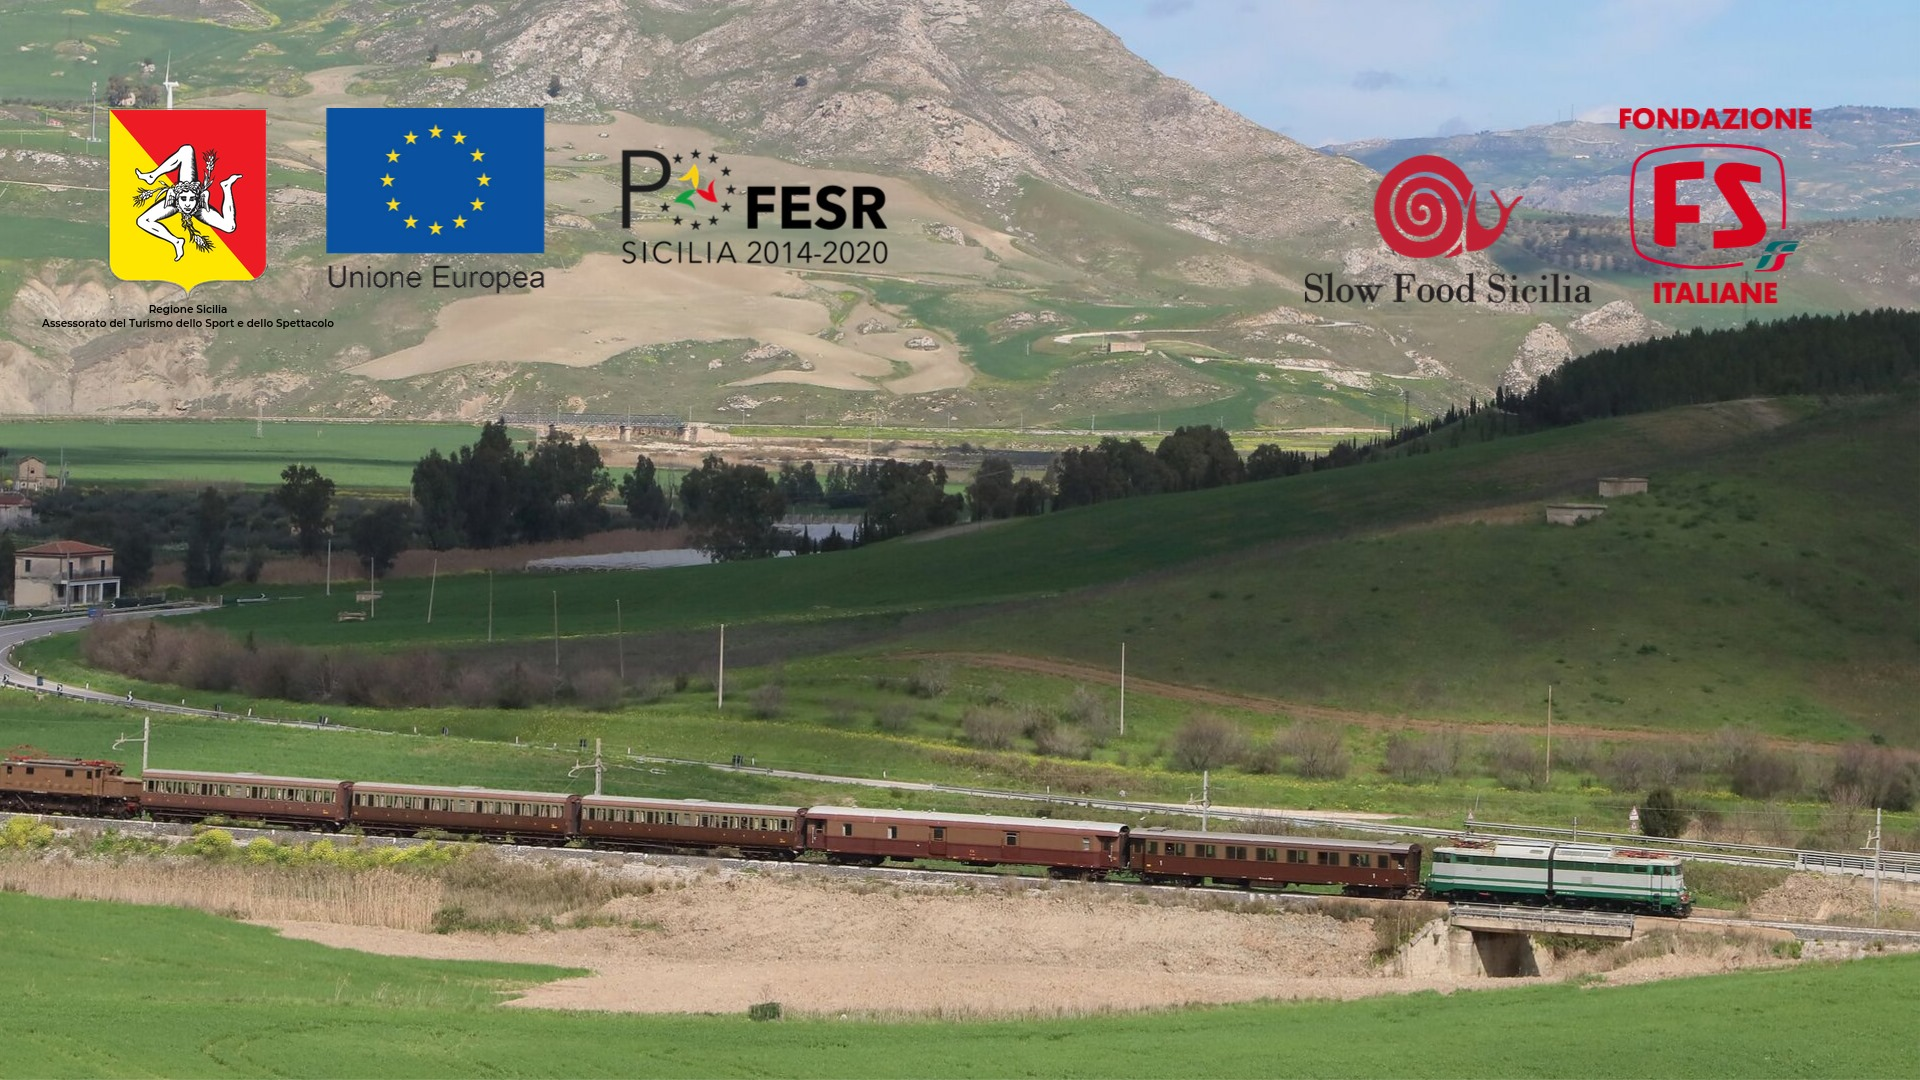 treno del 20 ottobre da Messina